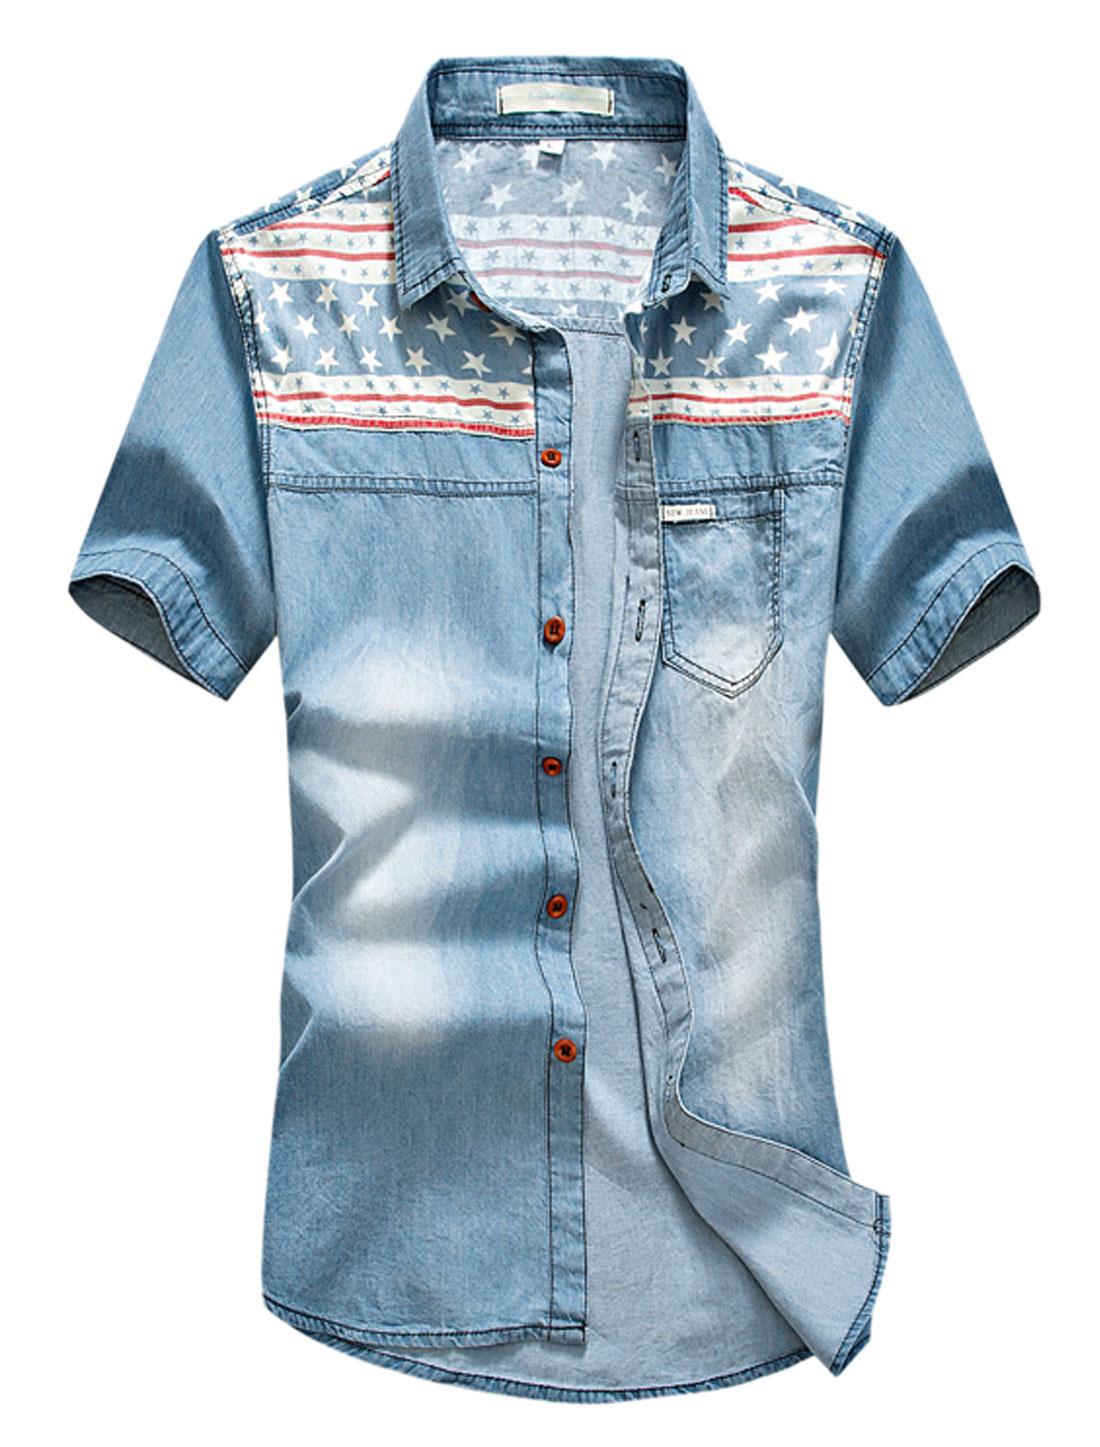 Men Stars Stripes Prints Single Breasted Denim Shirt Light Blue Red M